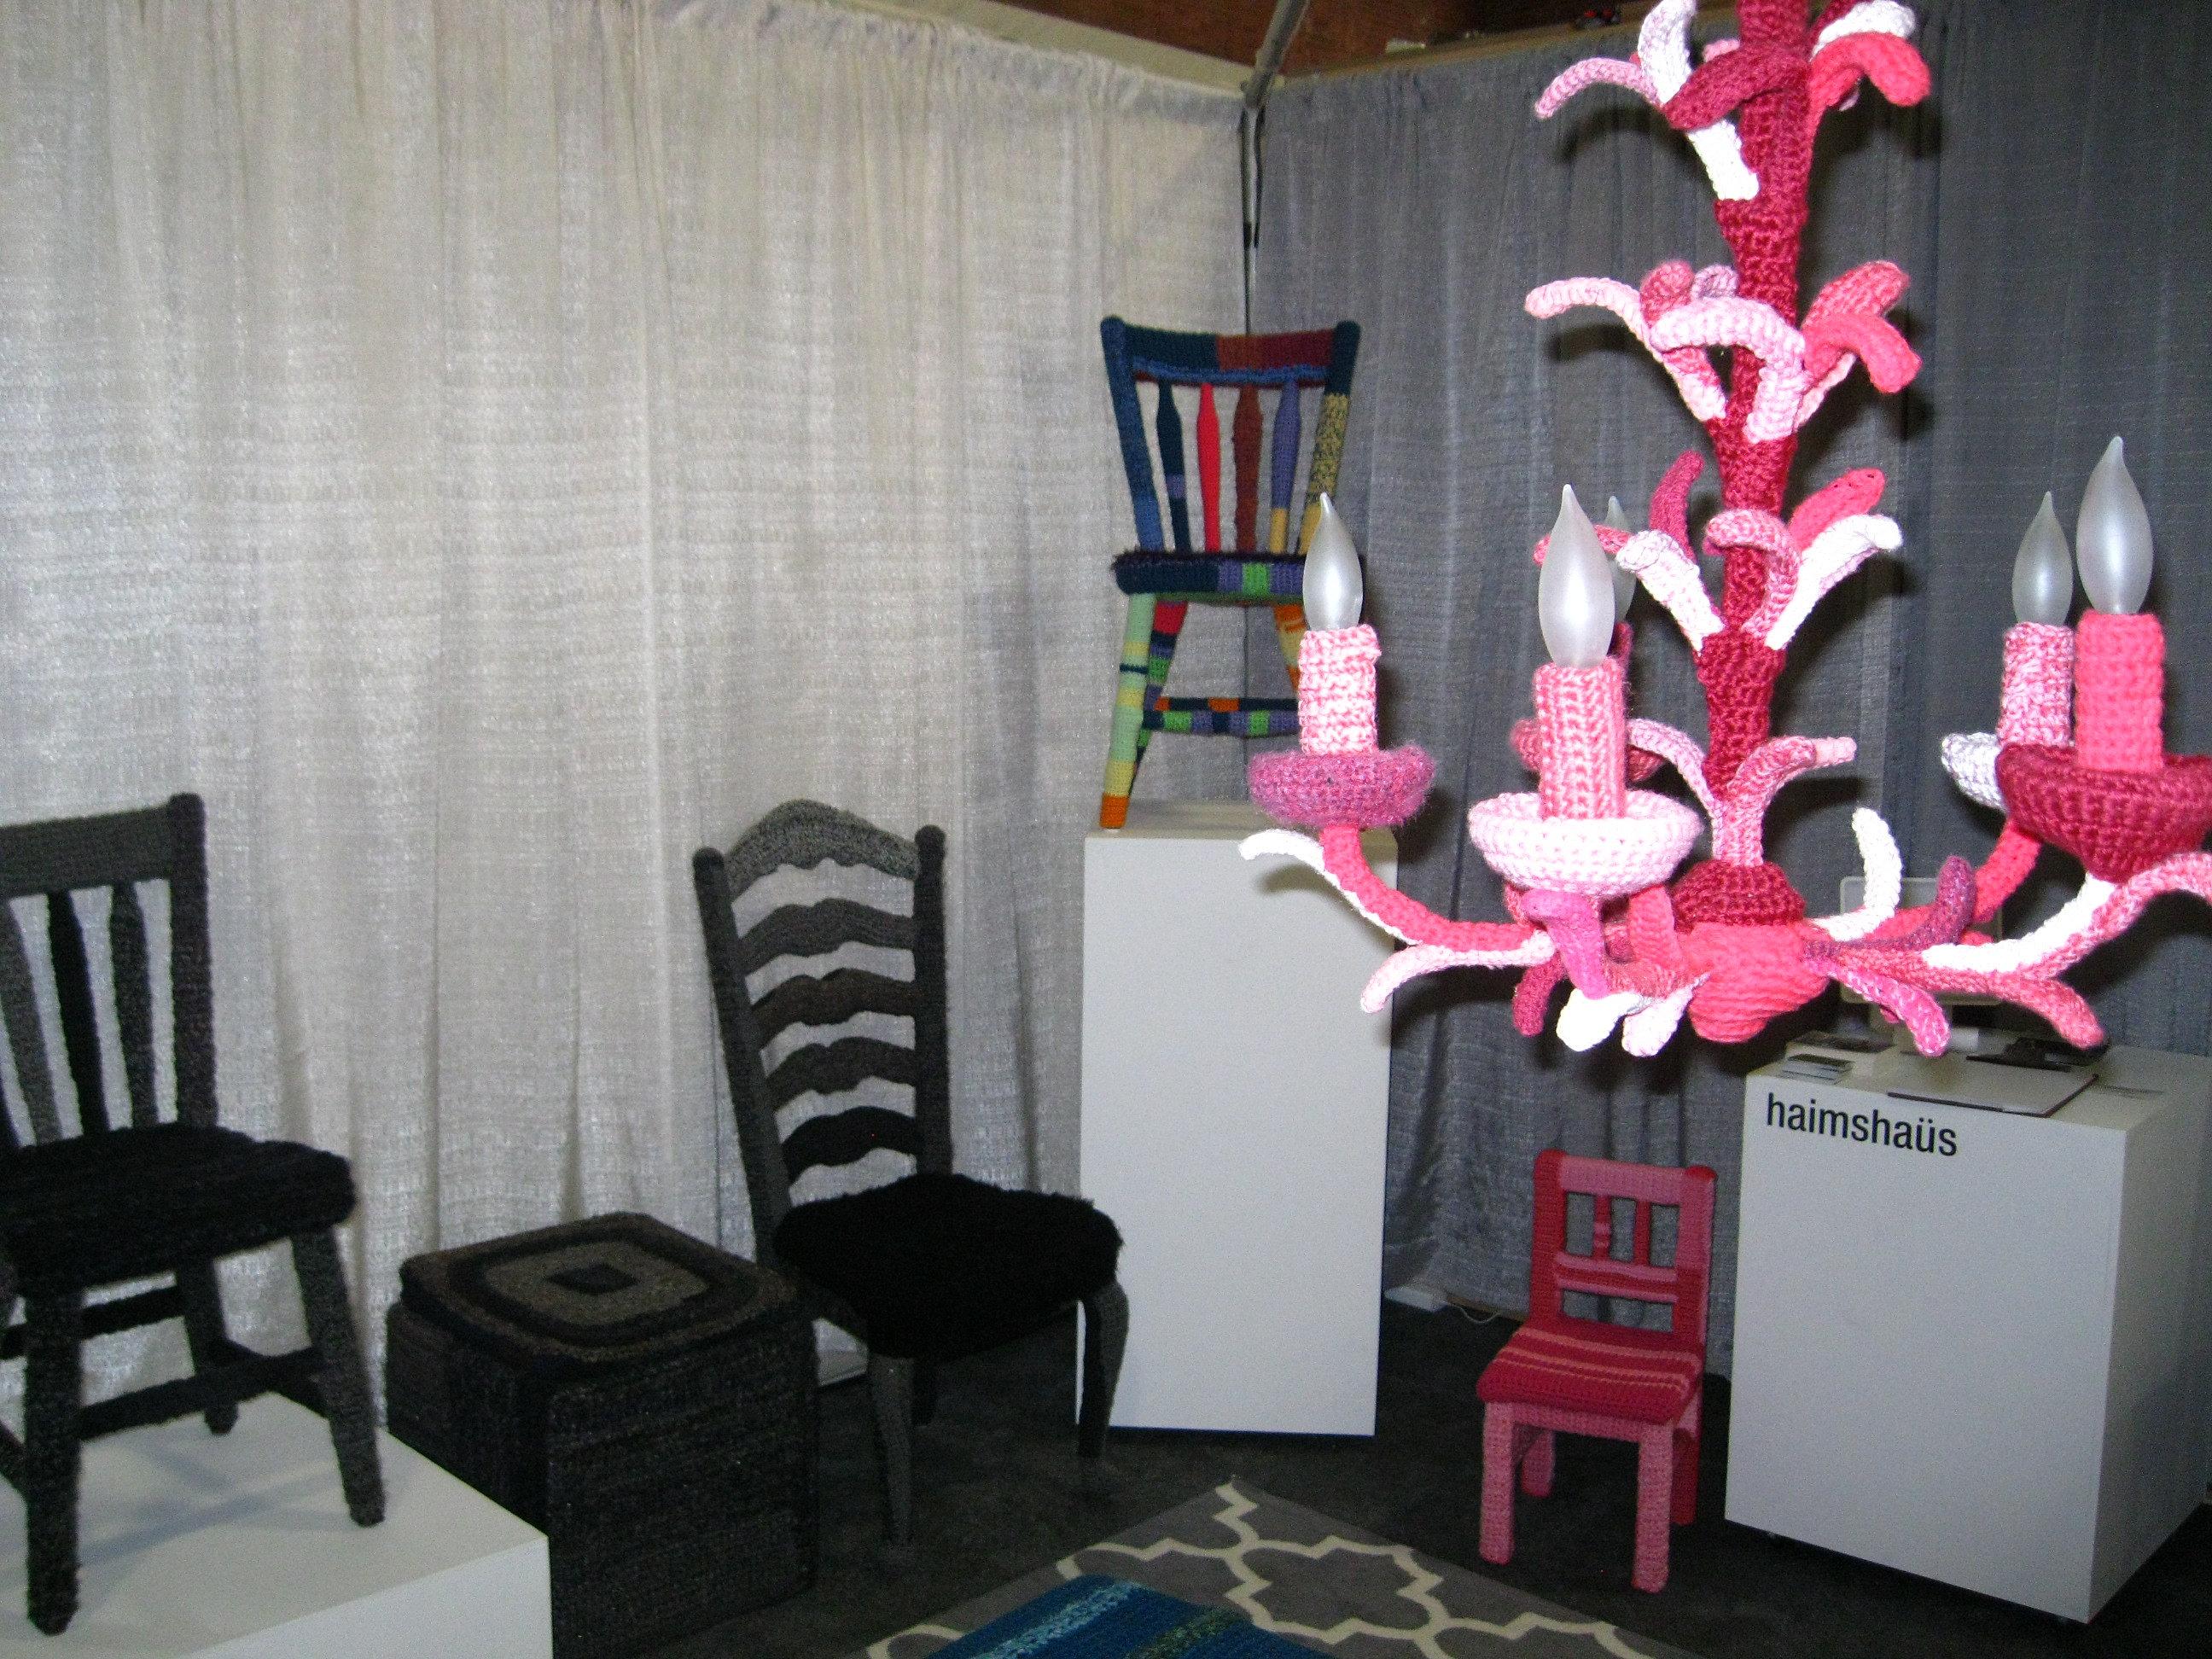 Philadelphia Furniture Show Img 0672 Jpg